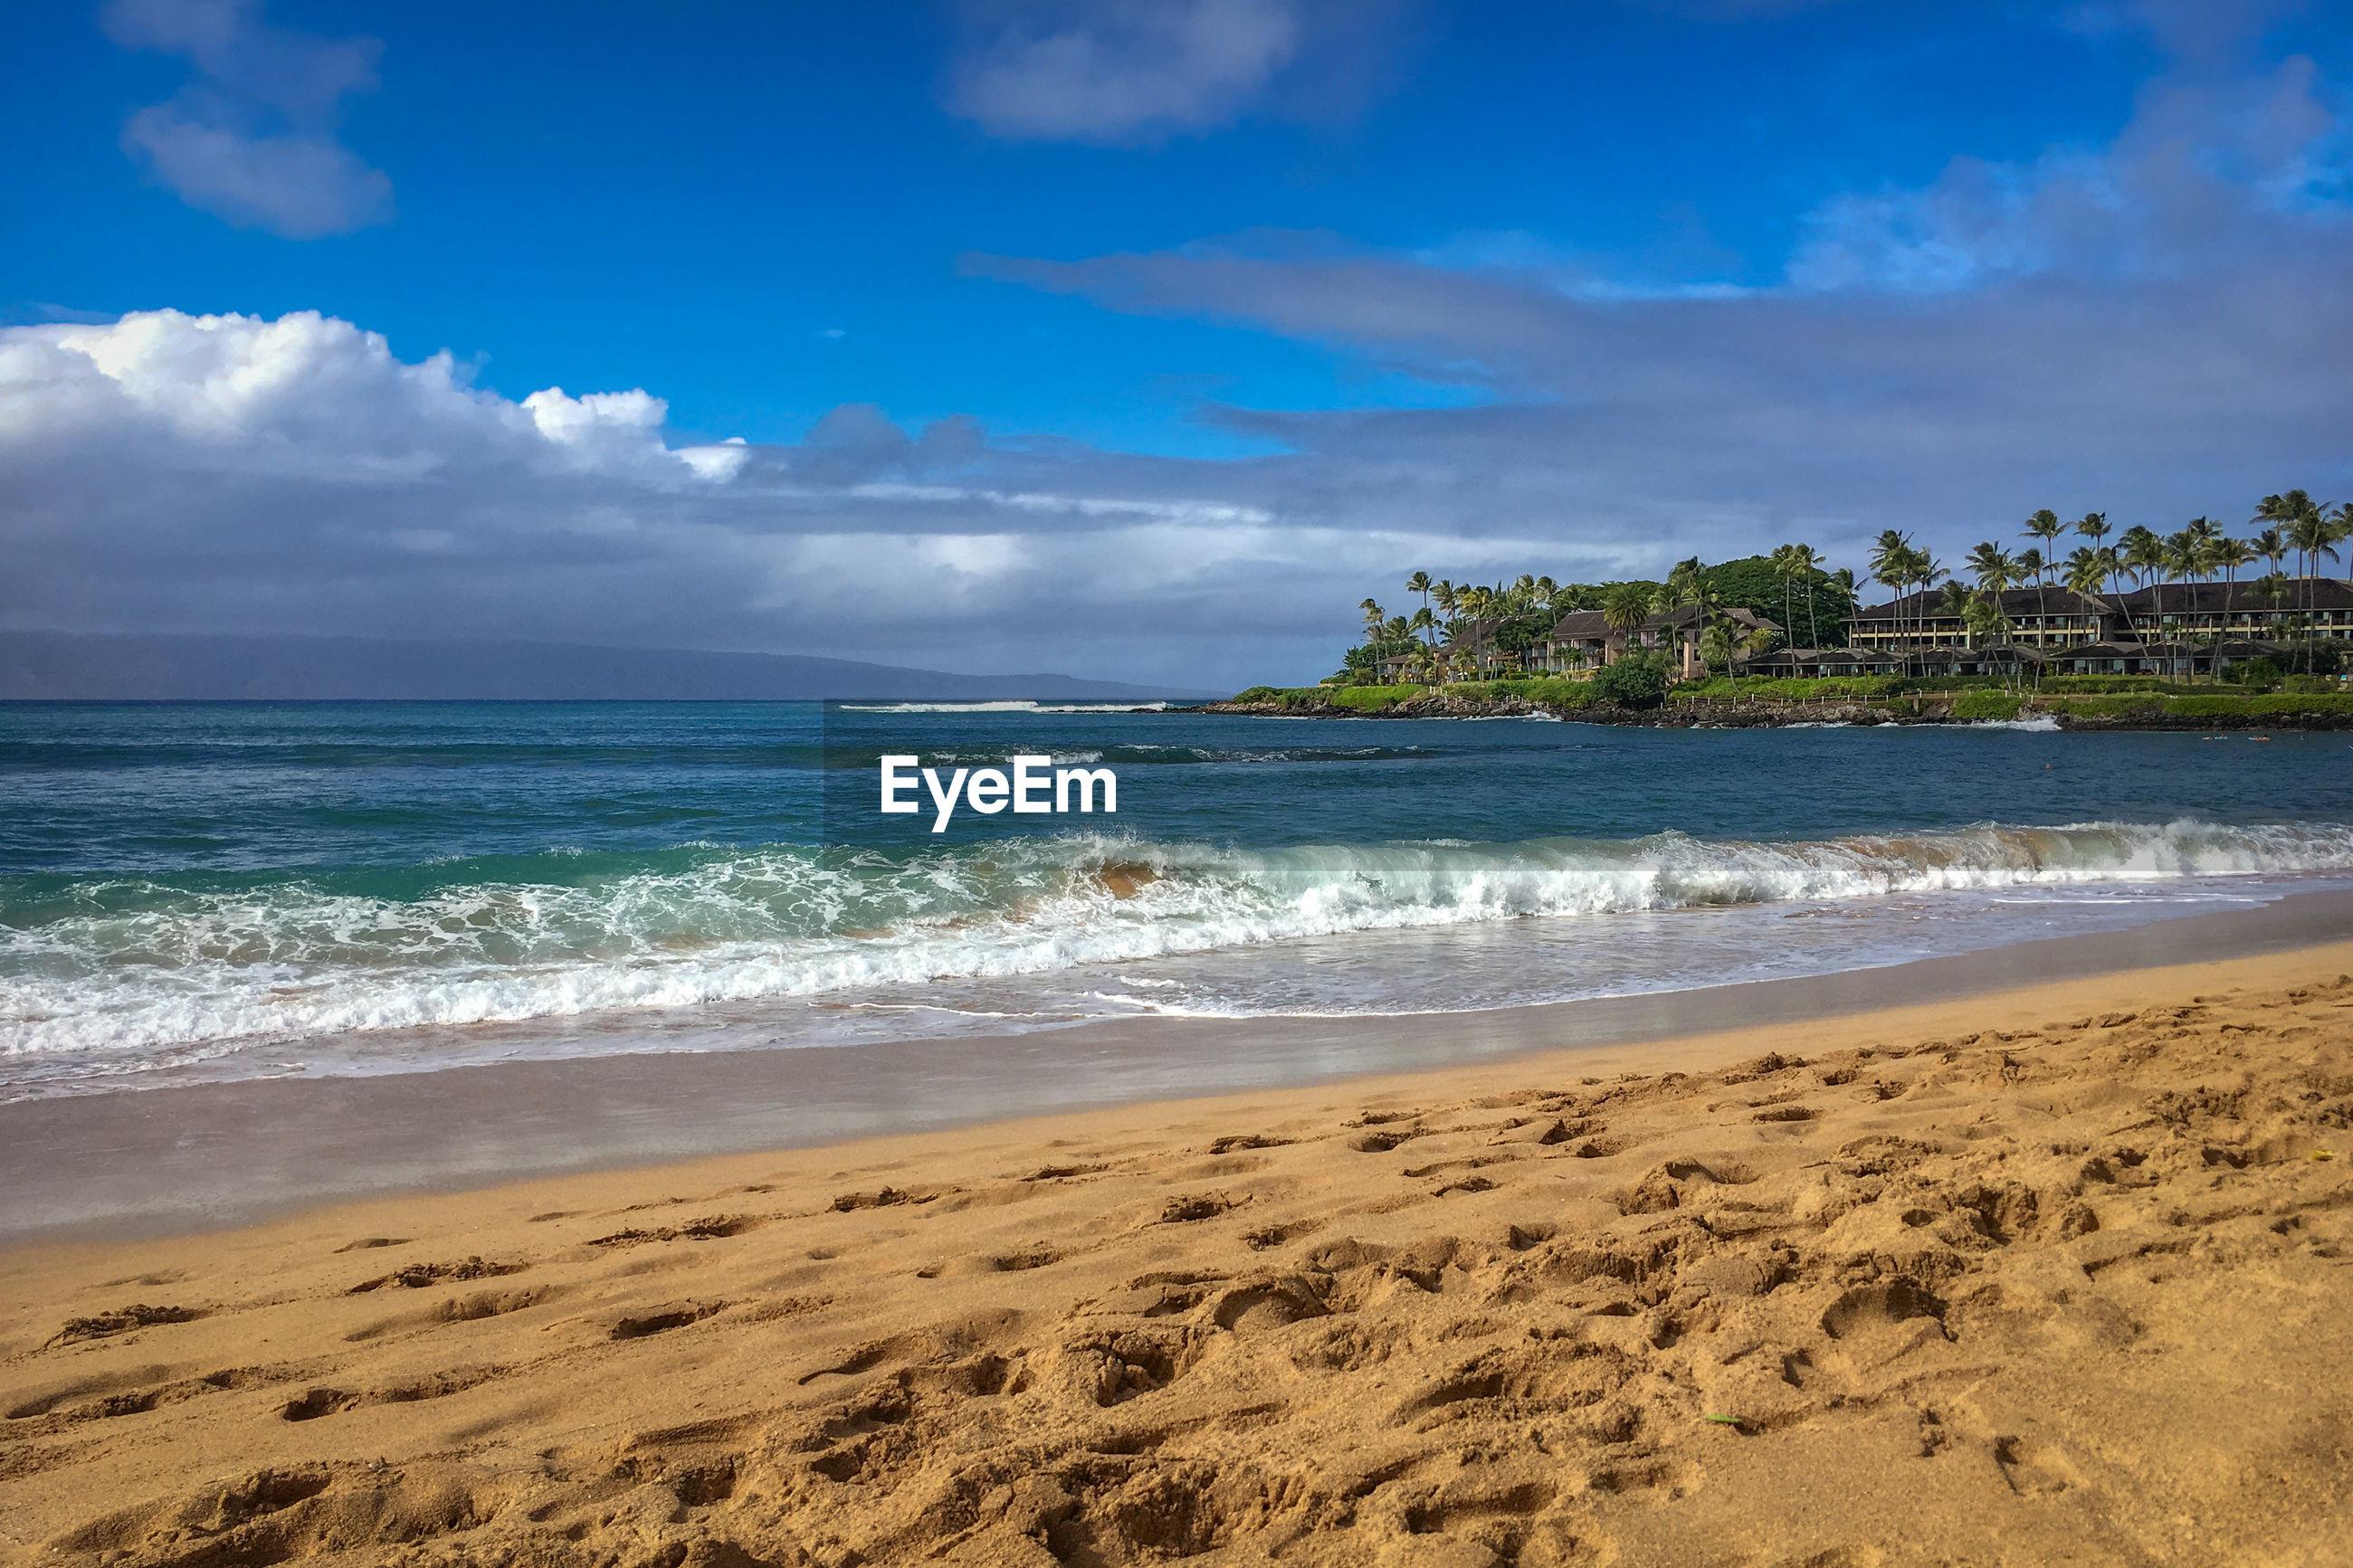 Scenic view of napili bay beach on the hawaiian island of maui, usa against sky